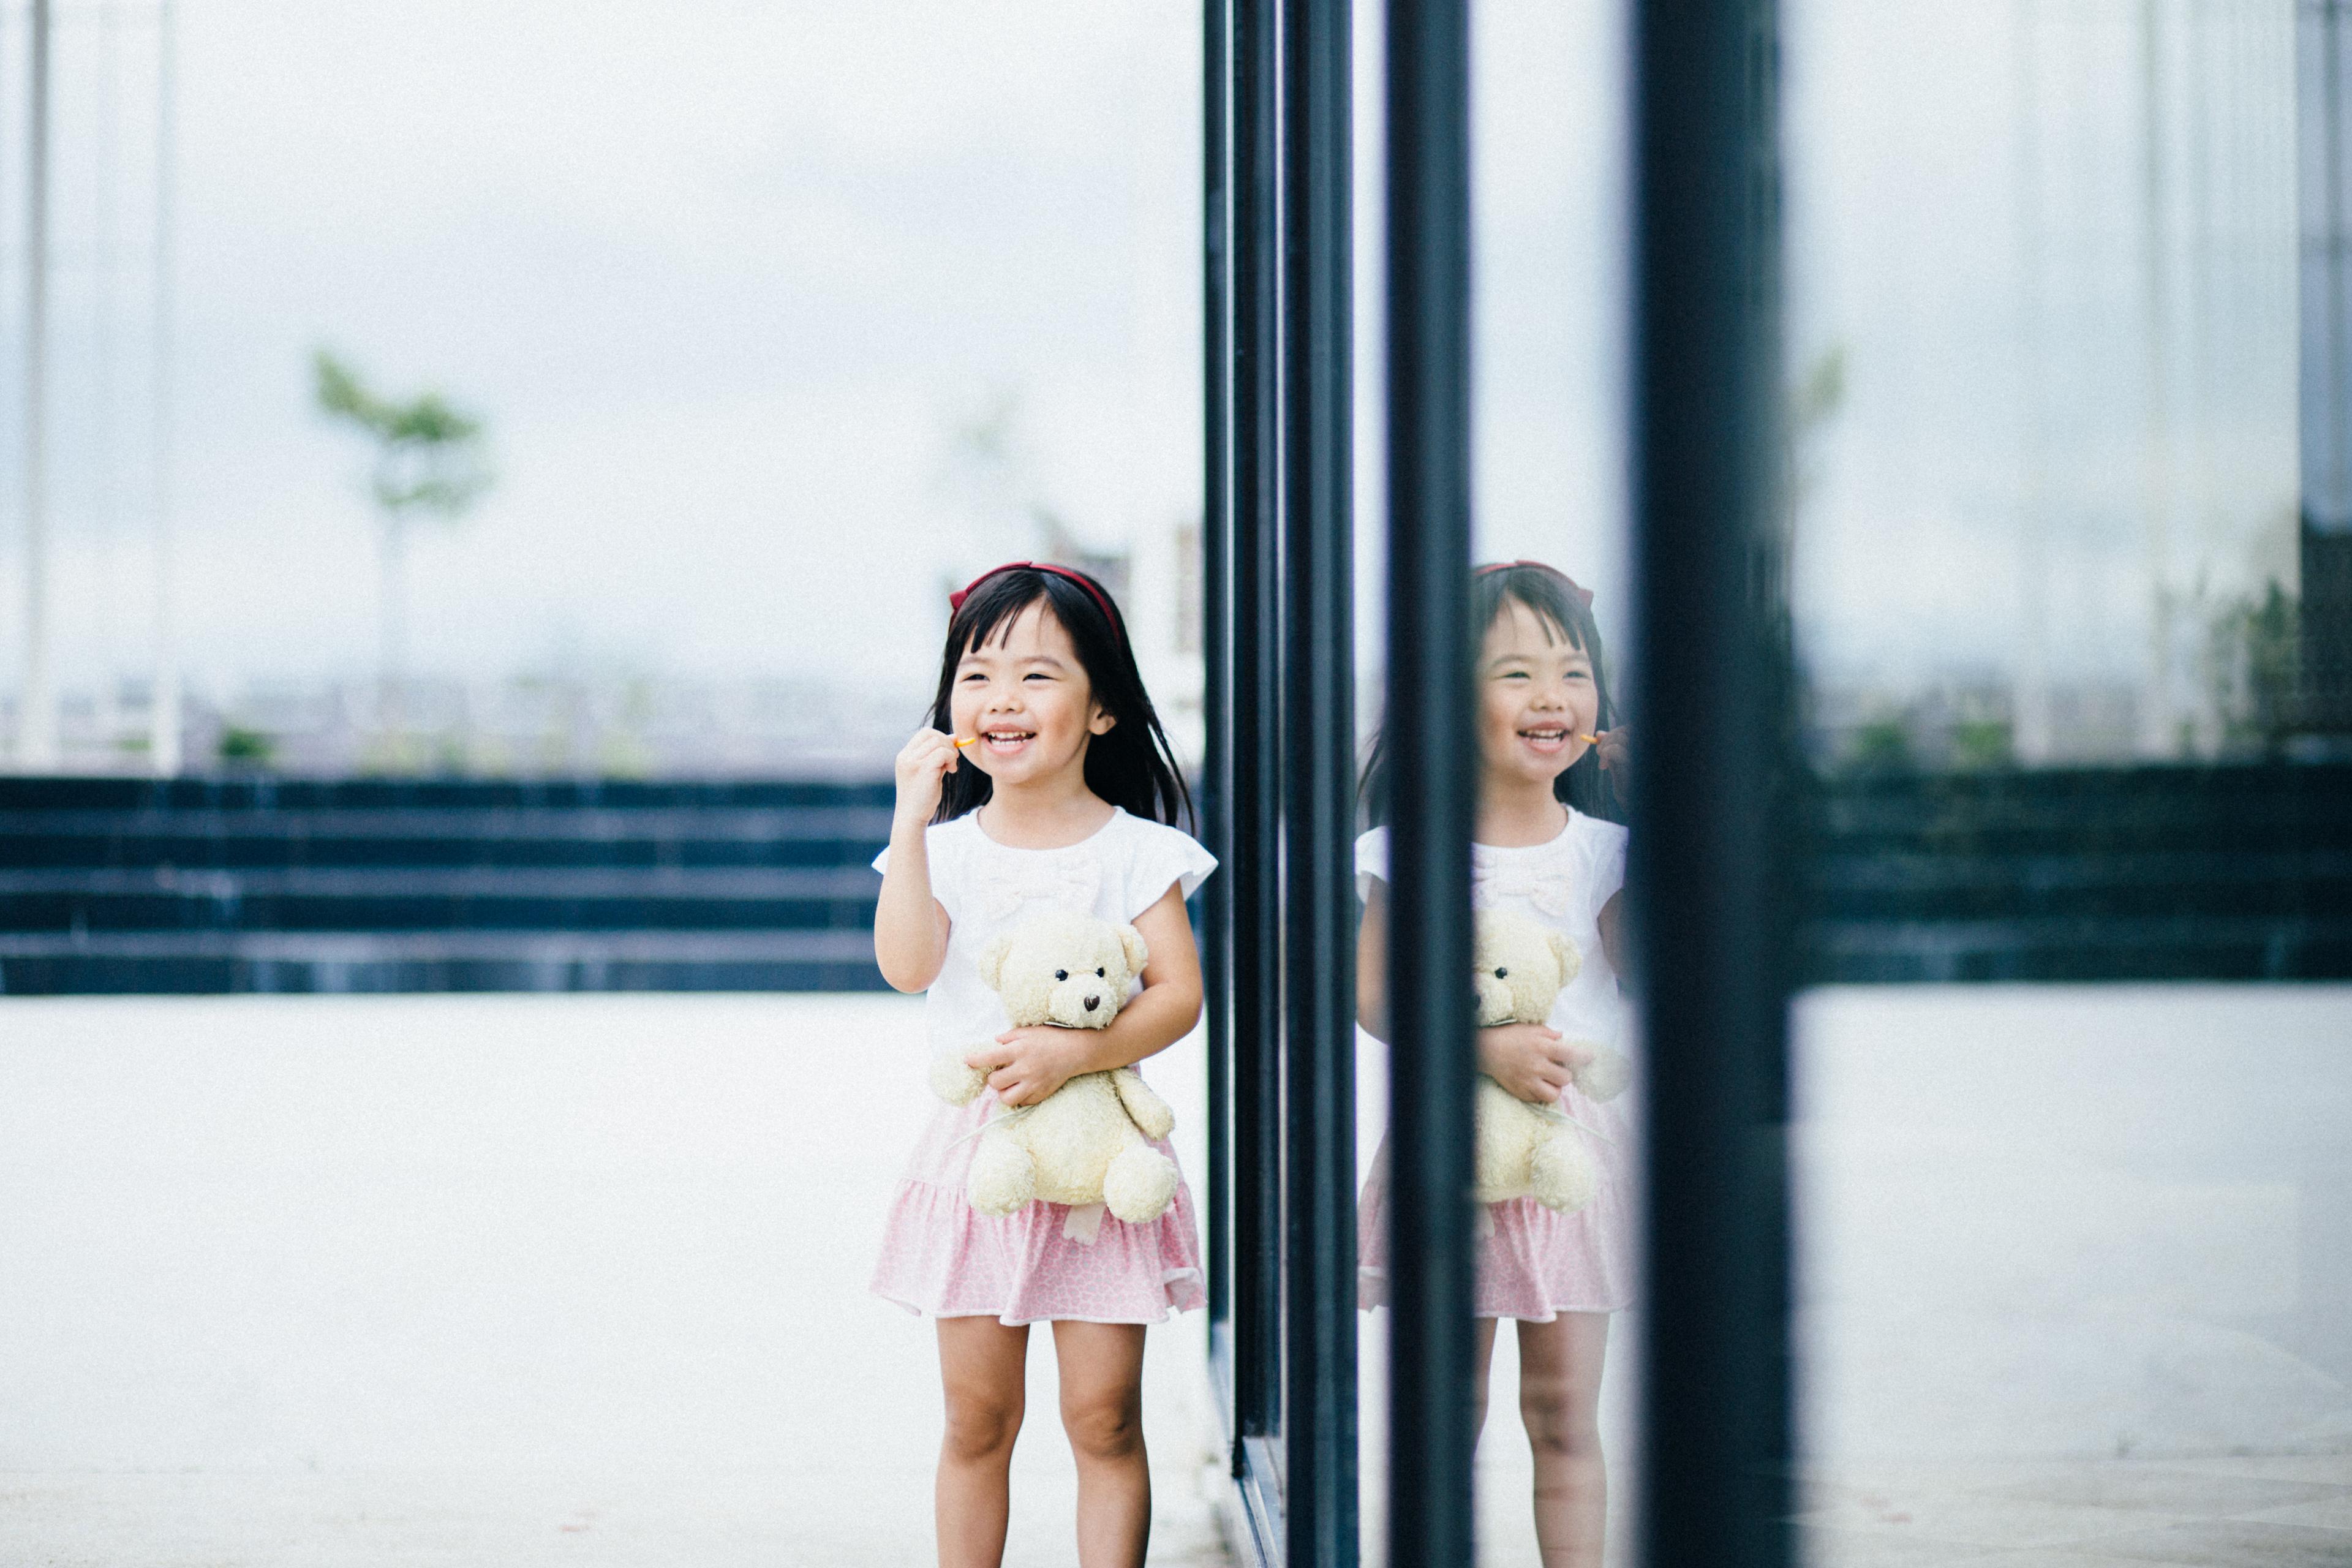 Child Childphotographer Portrait Photo Shoot